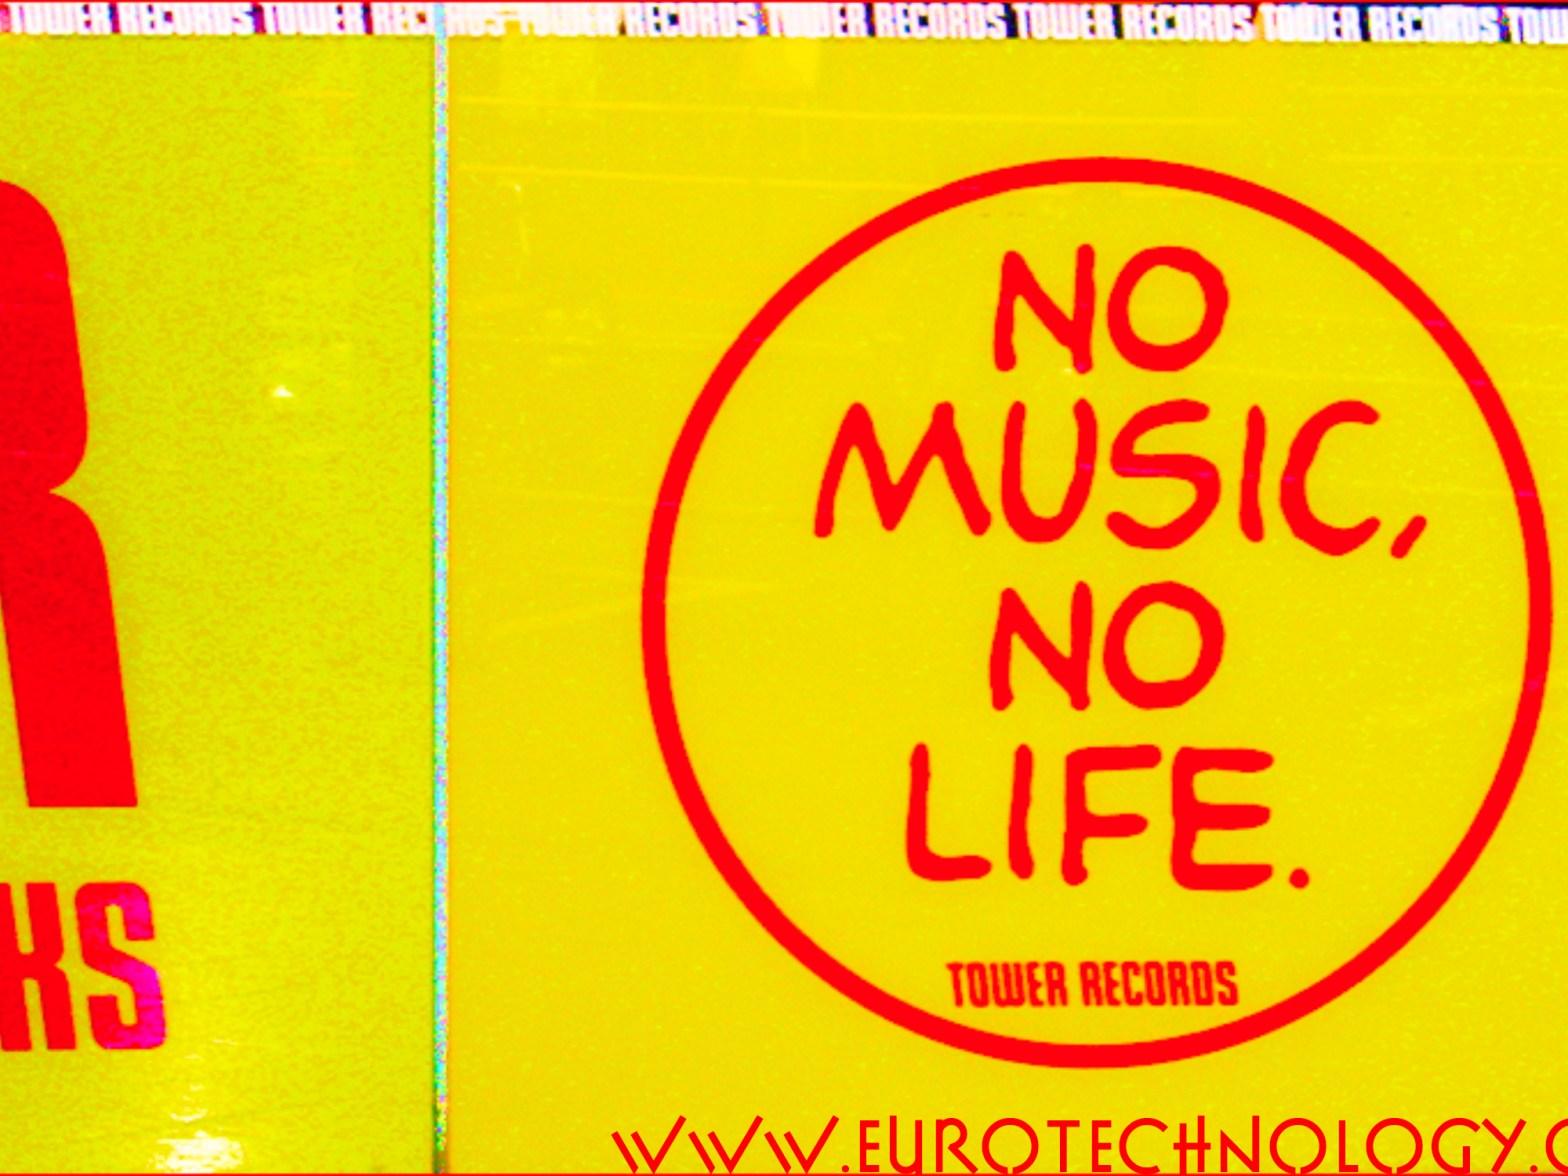 NTT Docomo acquisitions: Tower Records - No music, no life!